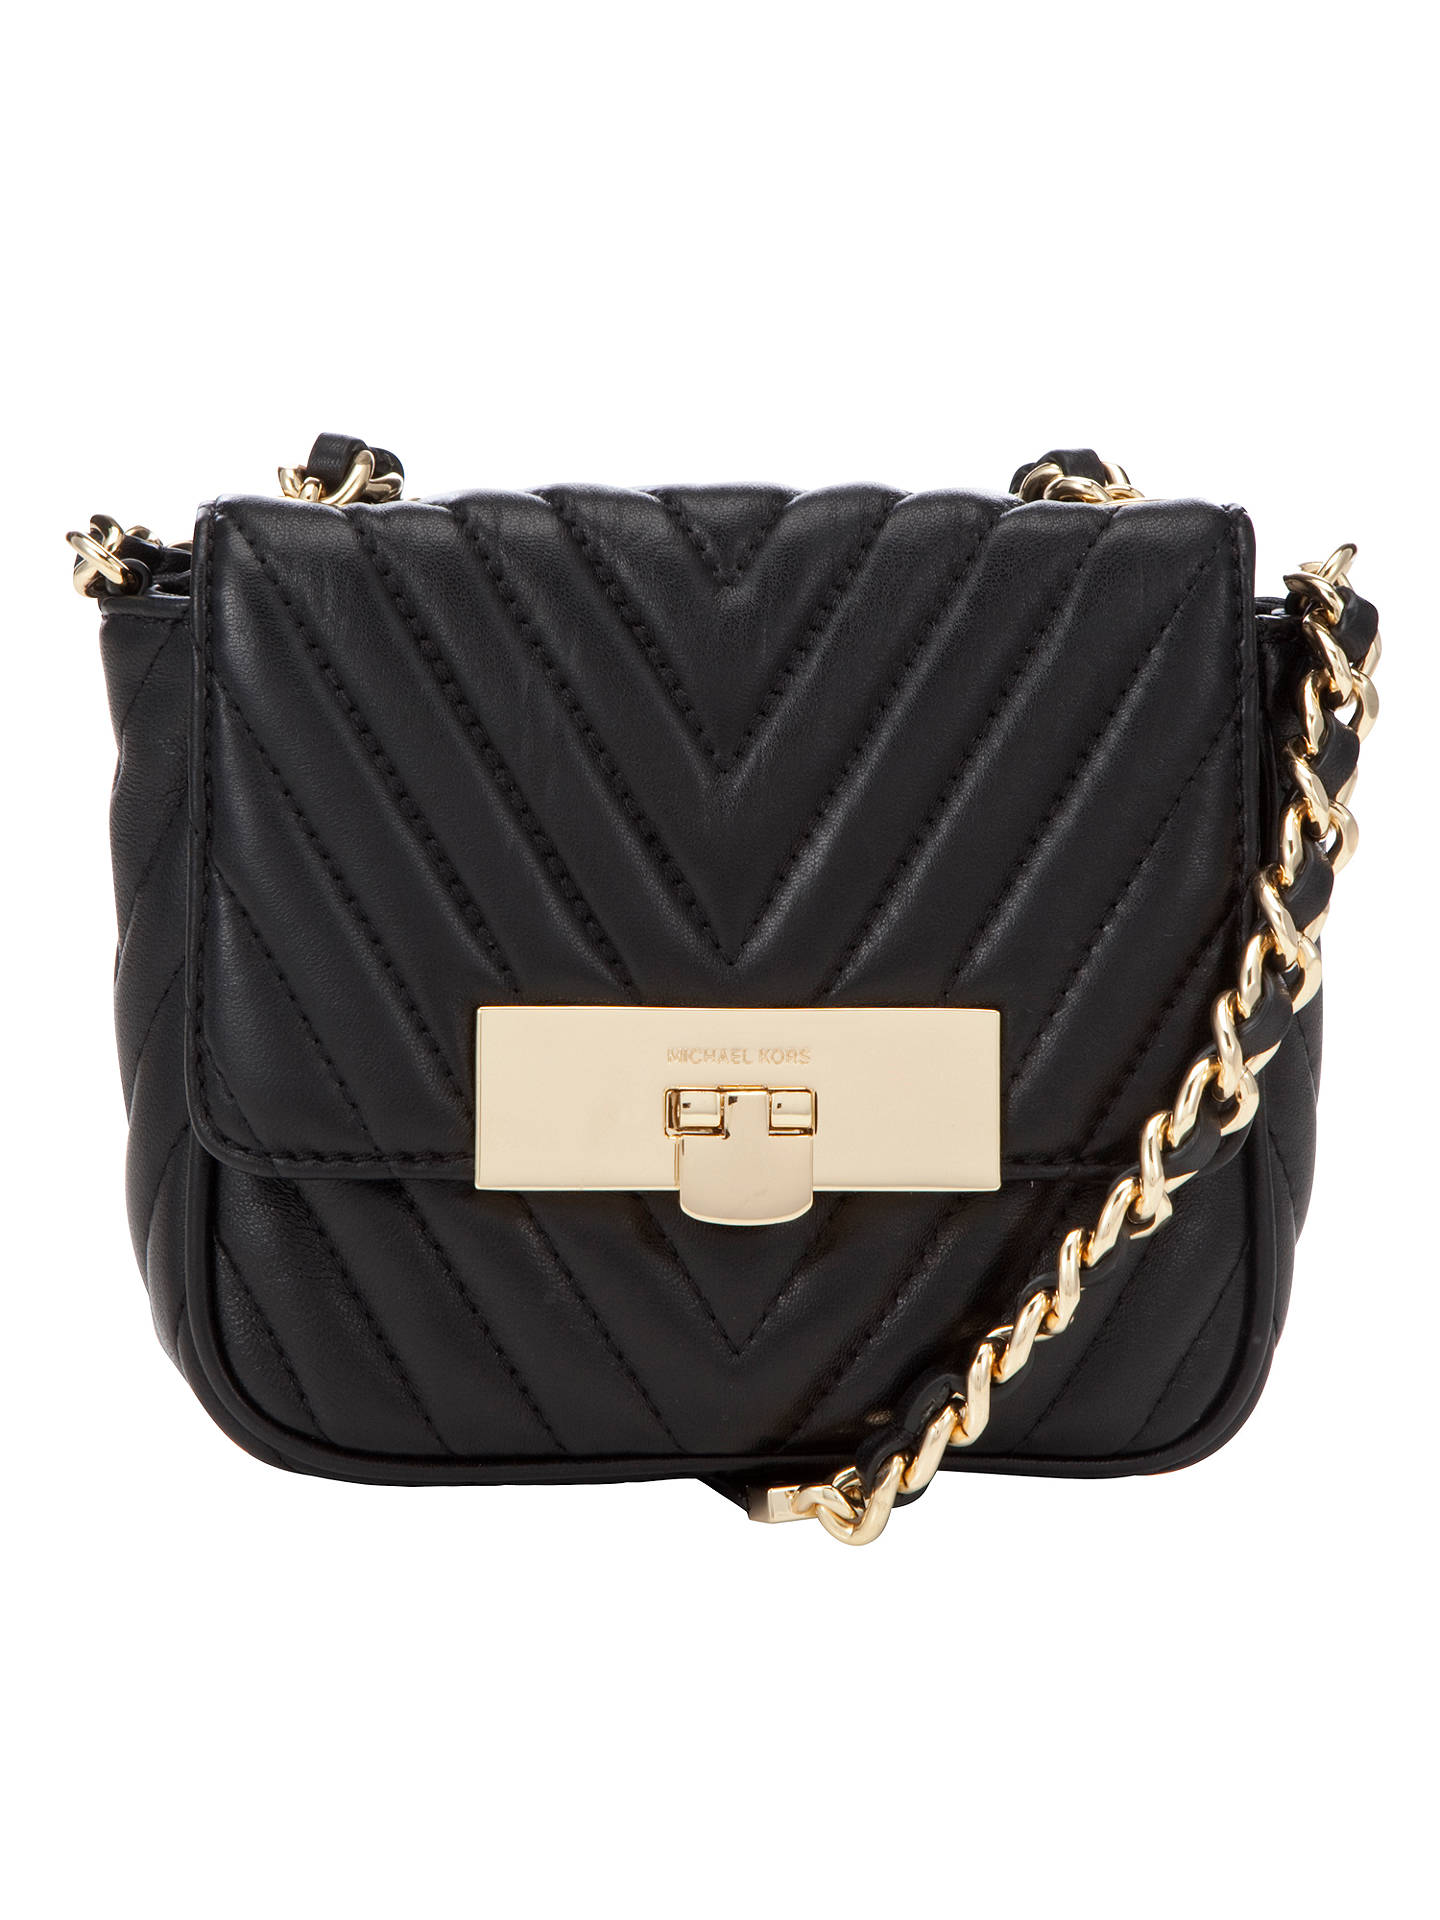 26cd68286005 MICHAEL Michael Kors Susannah Small Leather Messenger Bag at John ...